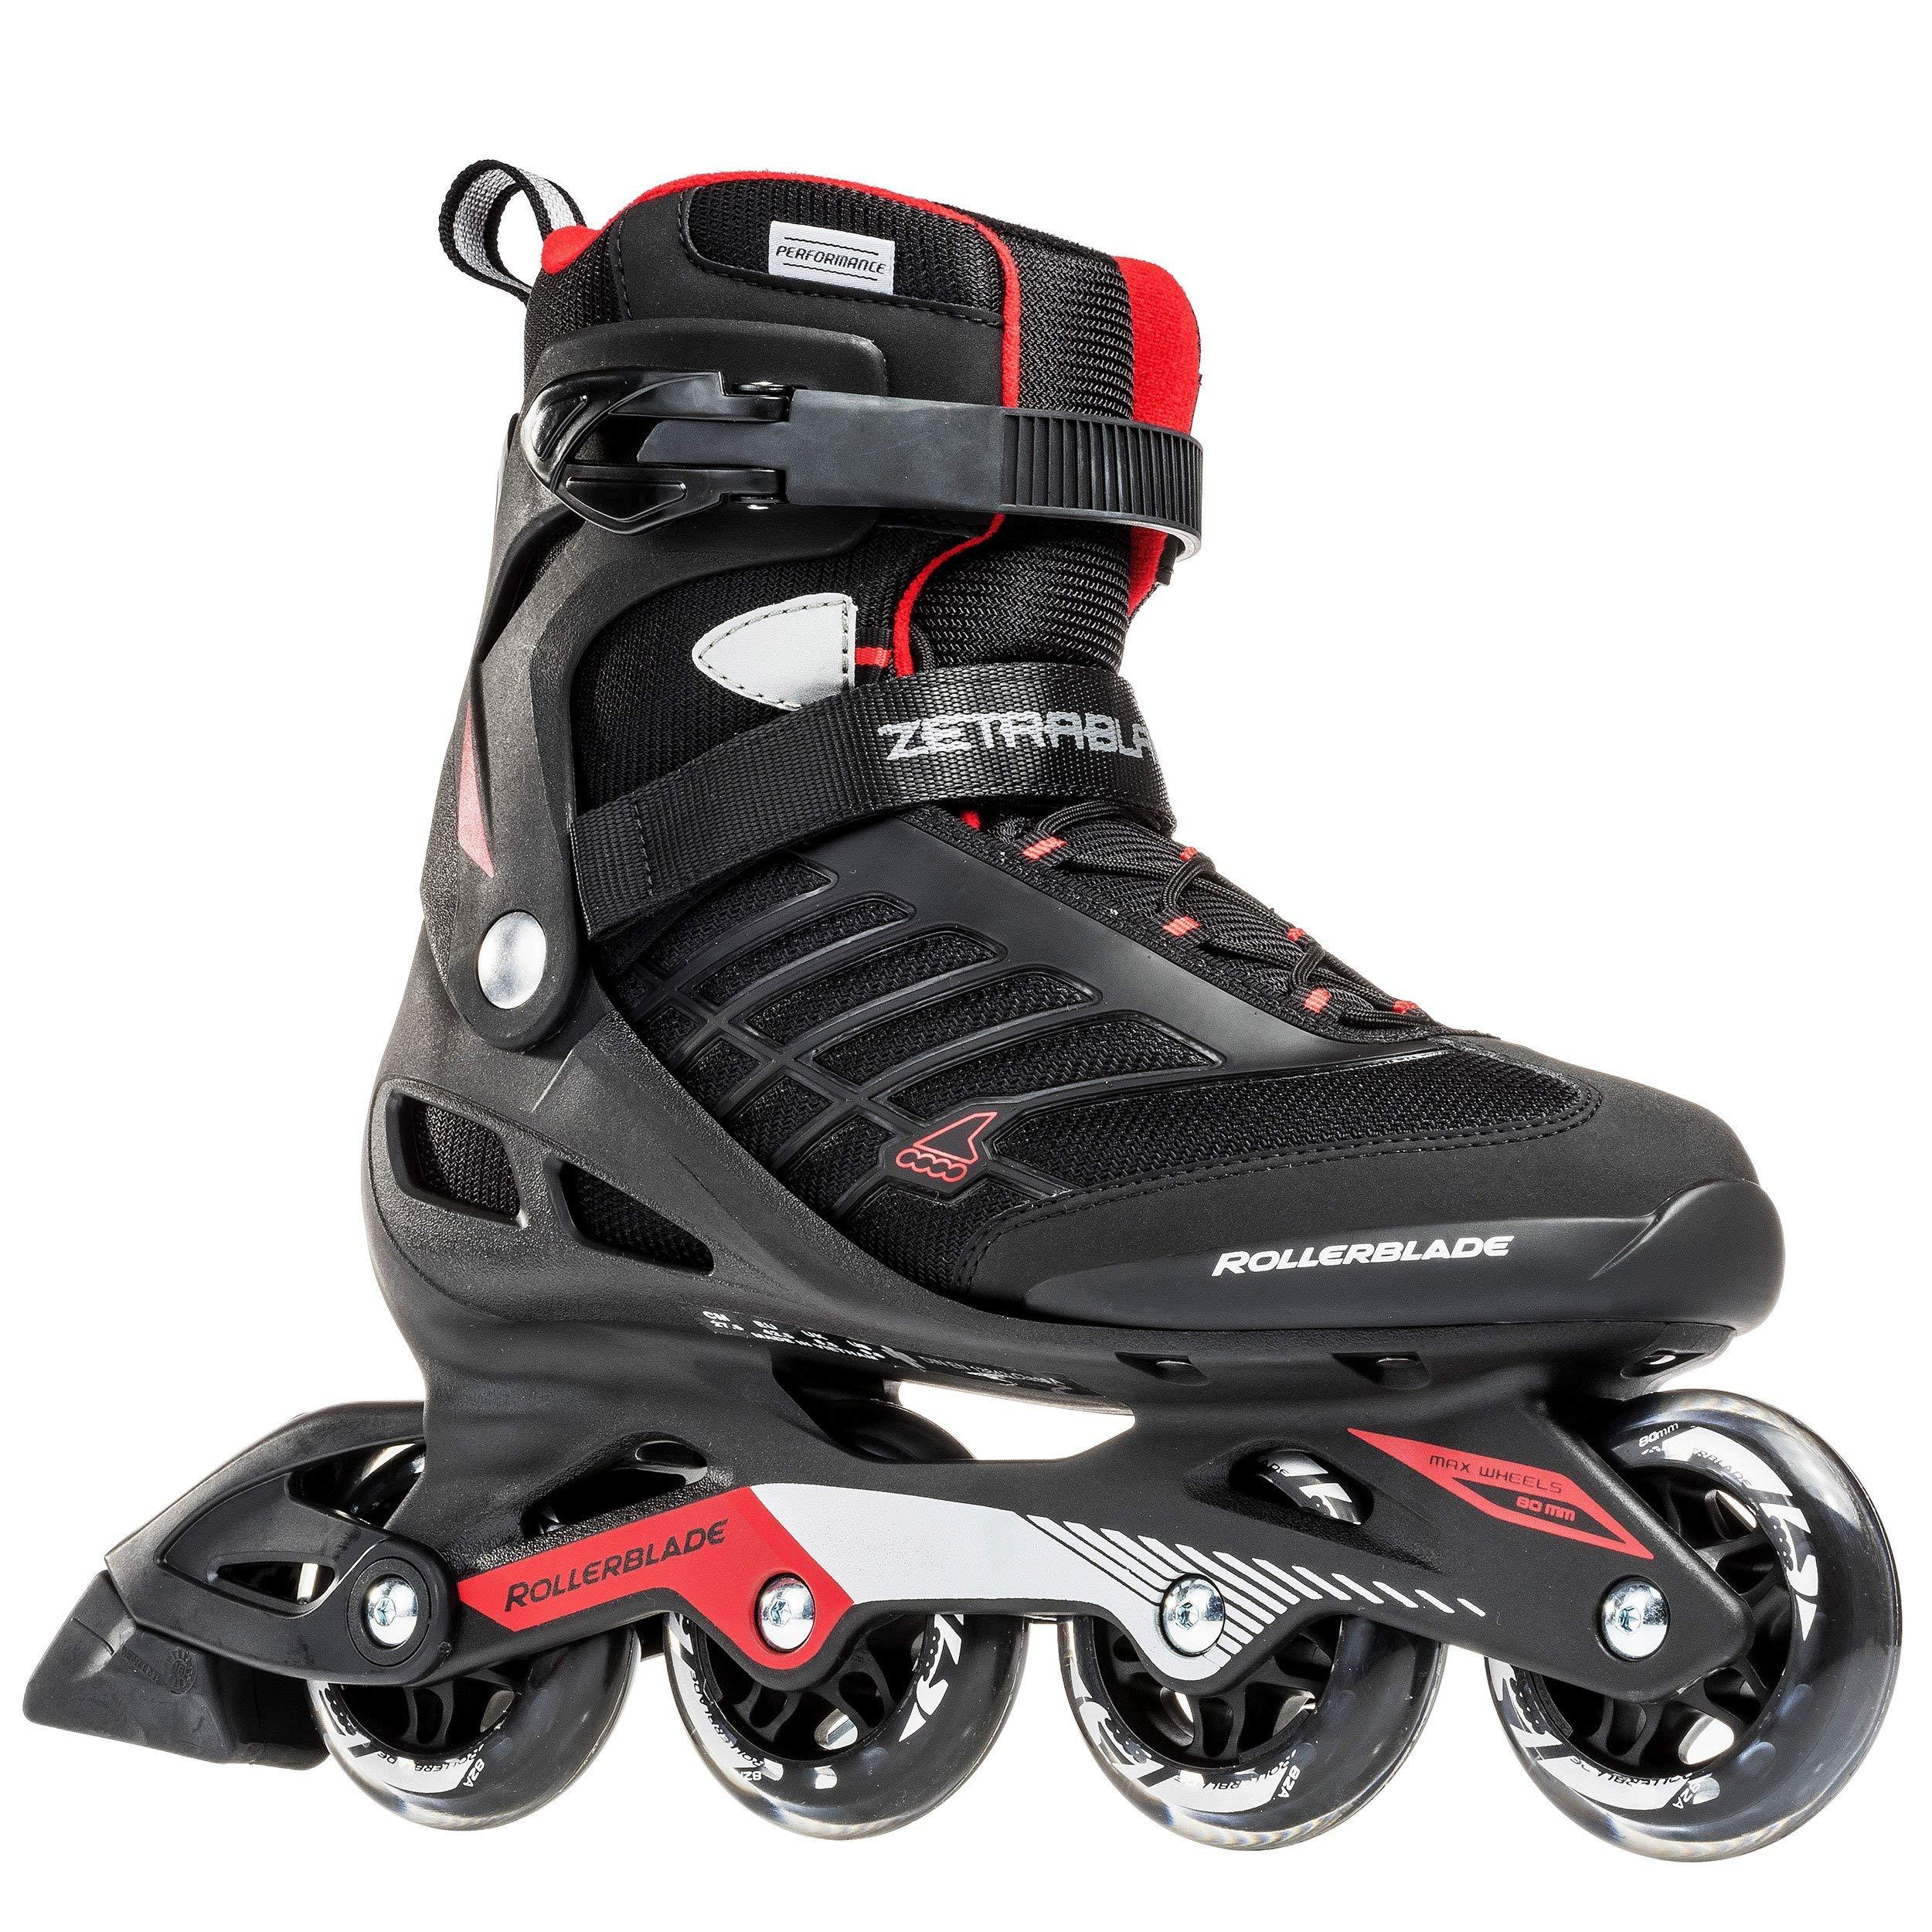 Rollerblade Zetrablade Skate - 4x80mm/84A Wheels - SG 5 Performance Bearings - Black/Red - US Men's 7 (25.0) (Renewed)